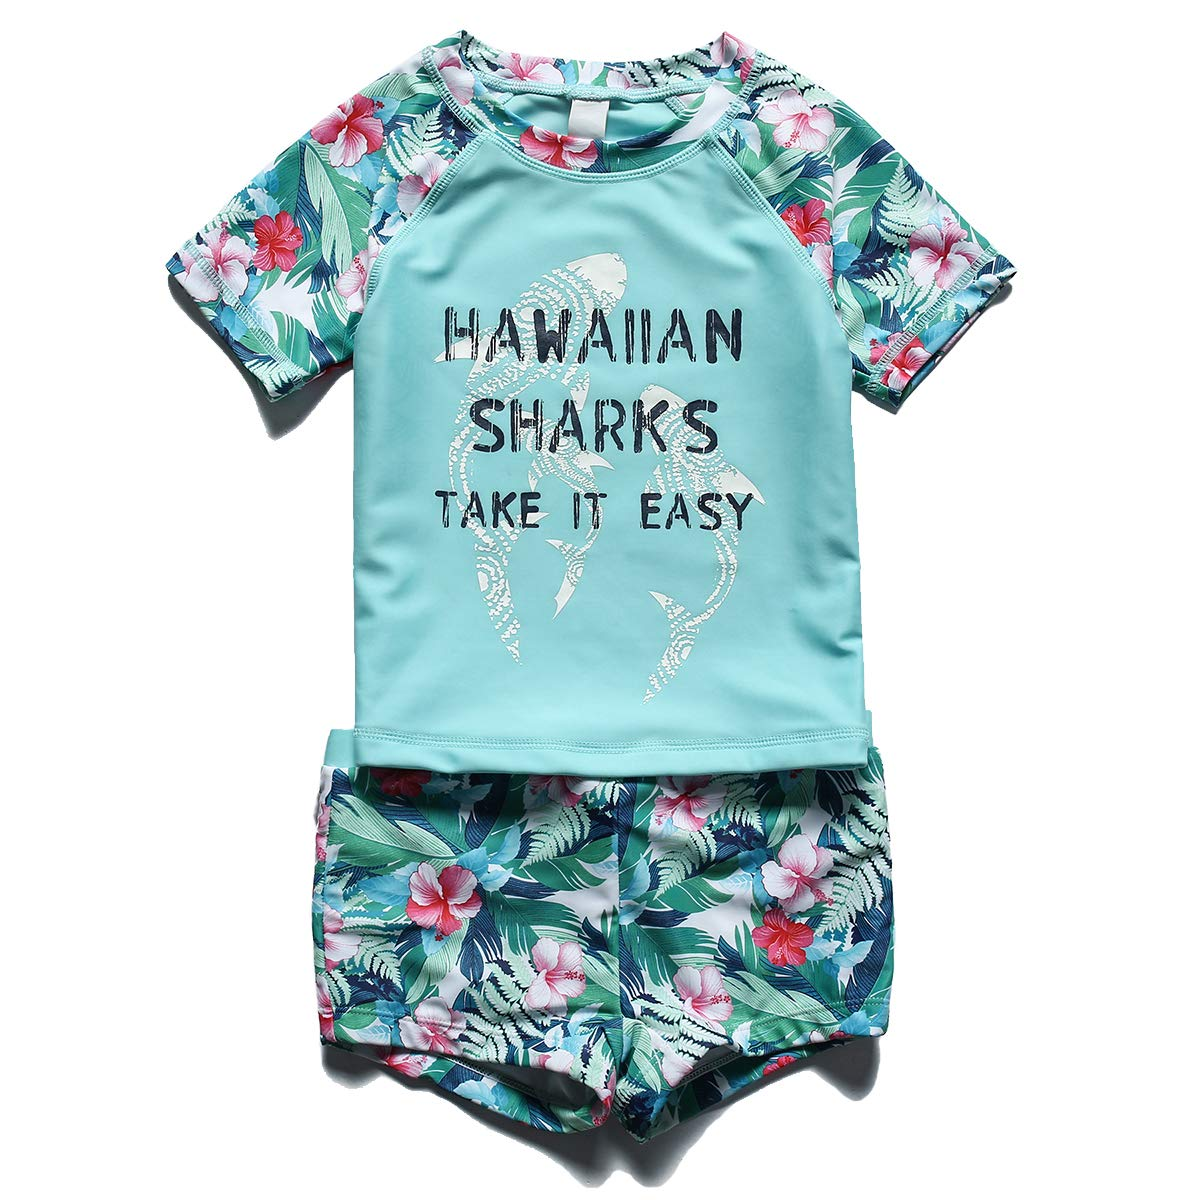 PHIBEE Girls Short Sleeve Rash Guard Set UPF 50 Sun Protection Two-Piece Swimwear Kangya